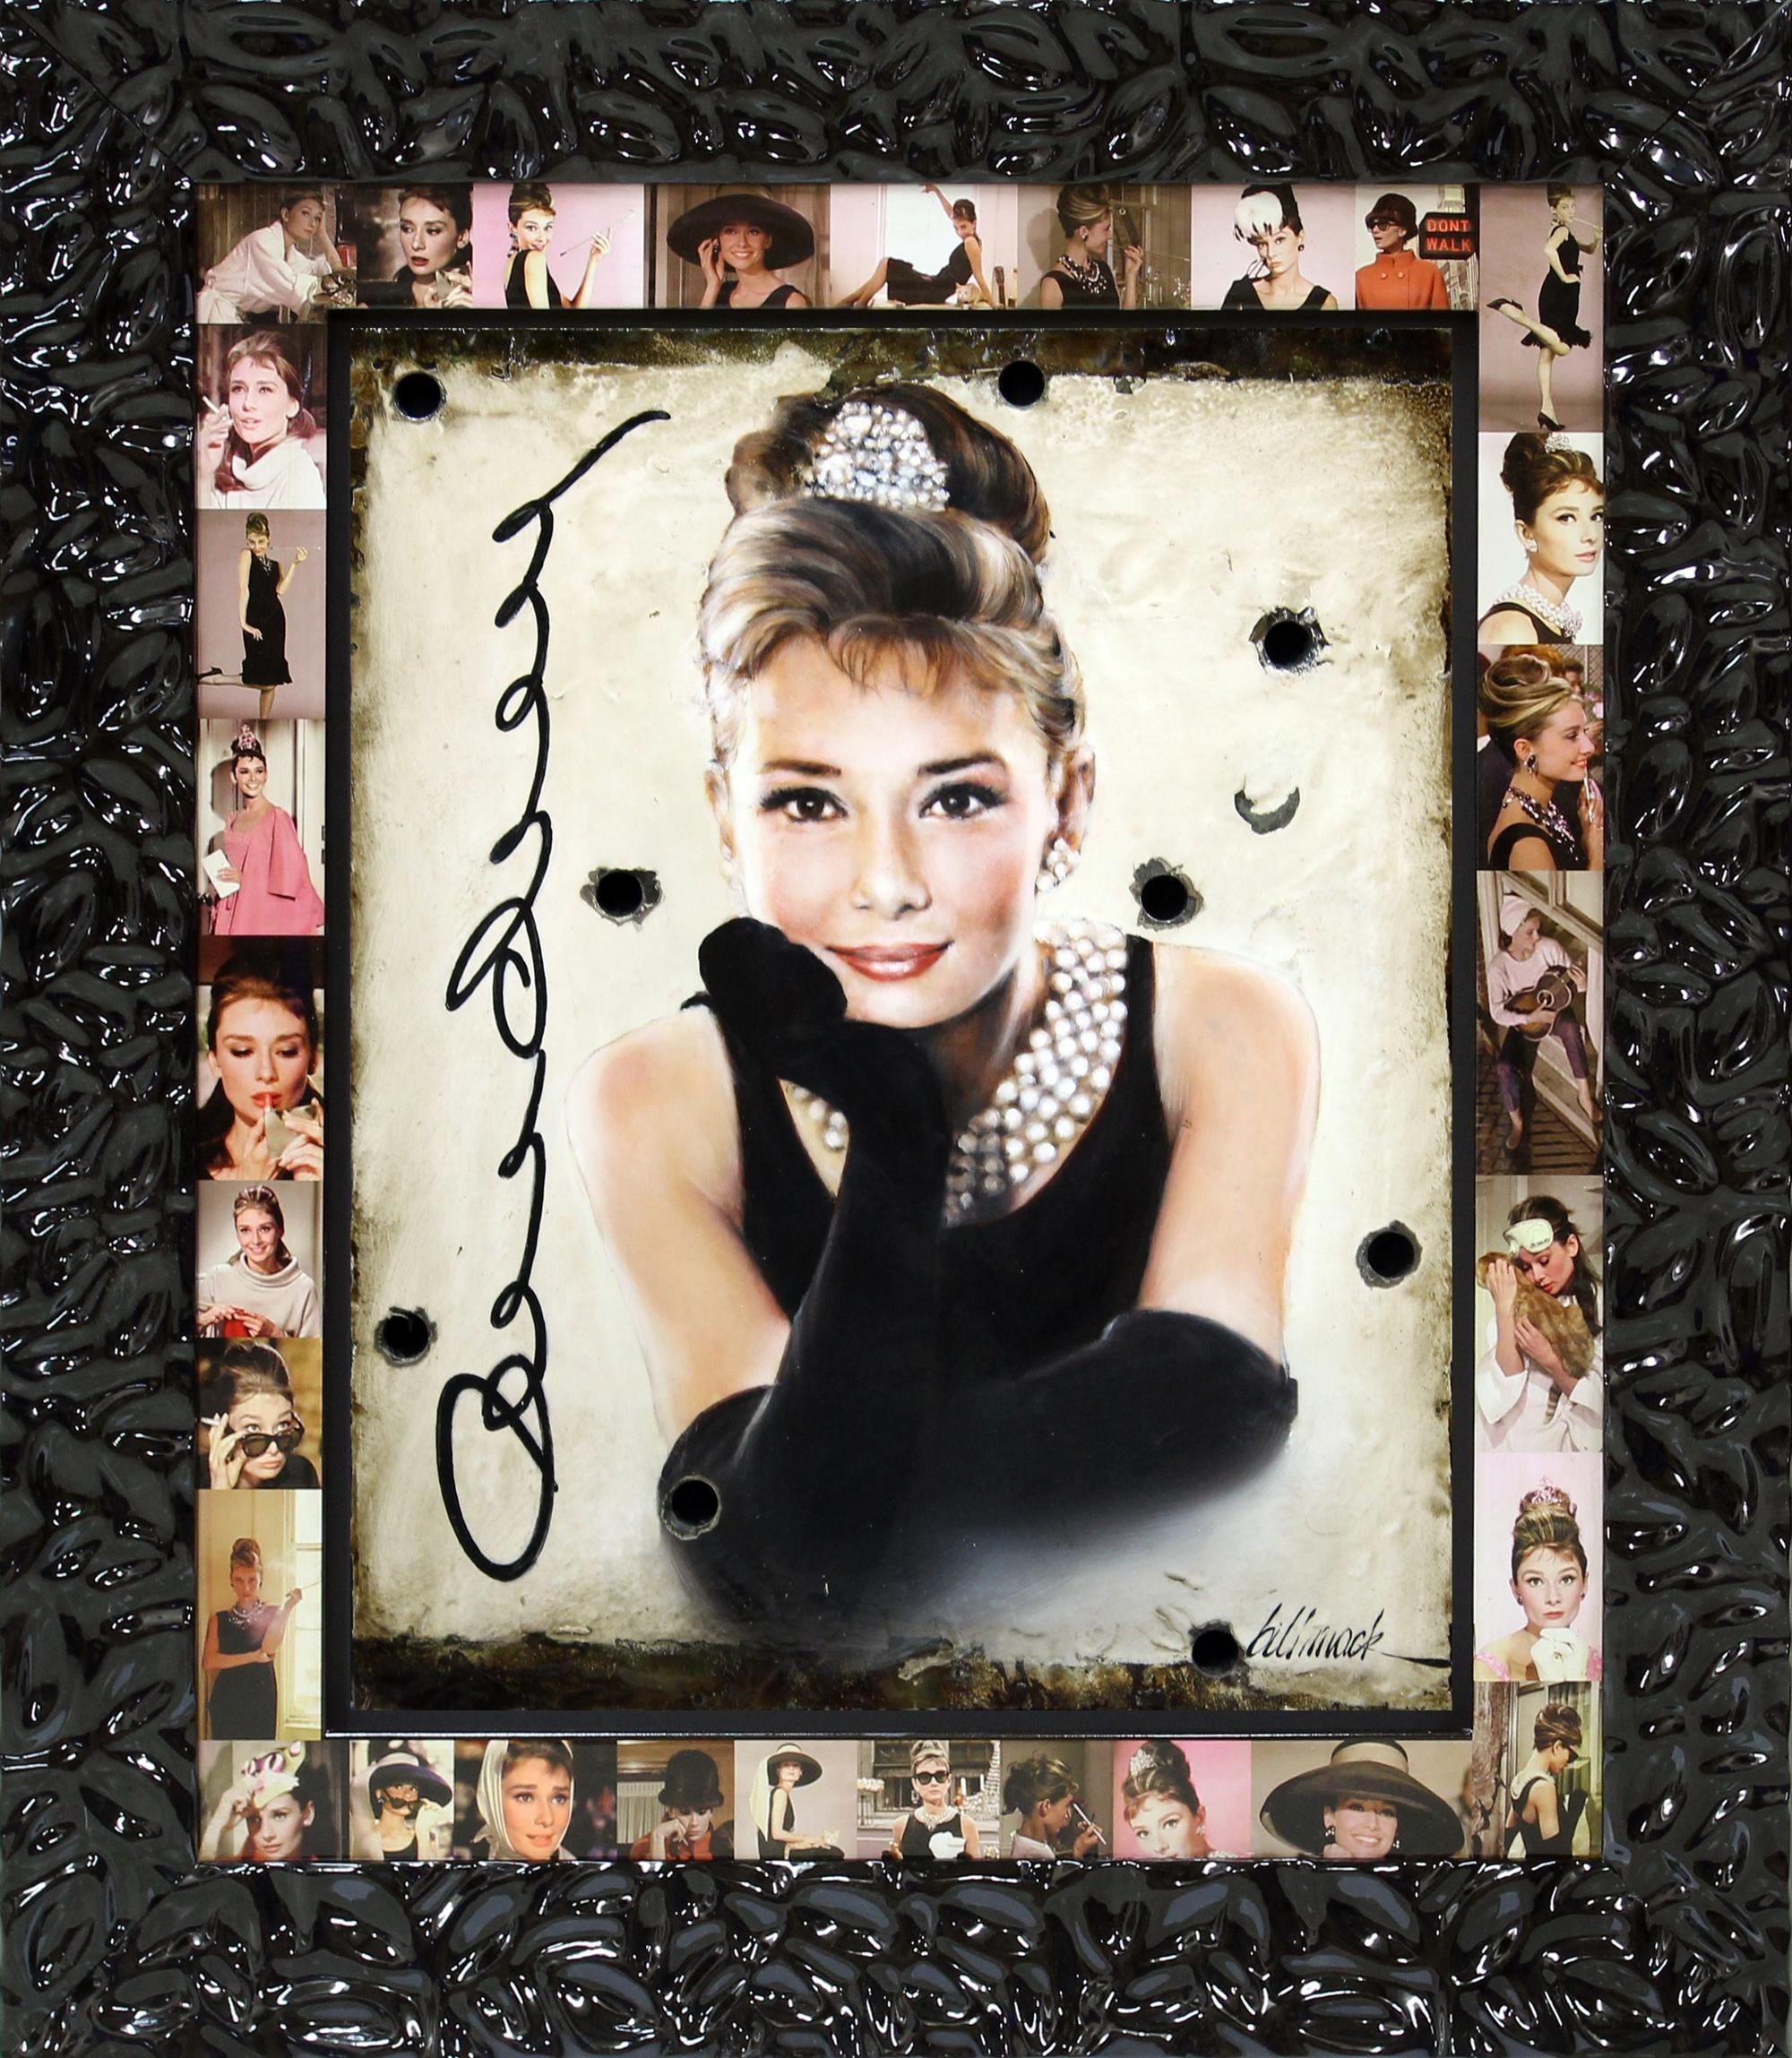 Audrey by Bill Mack